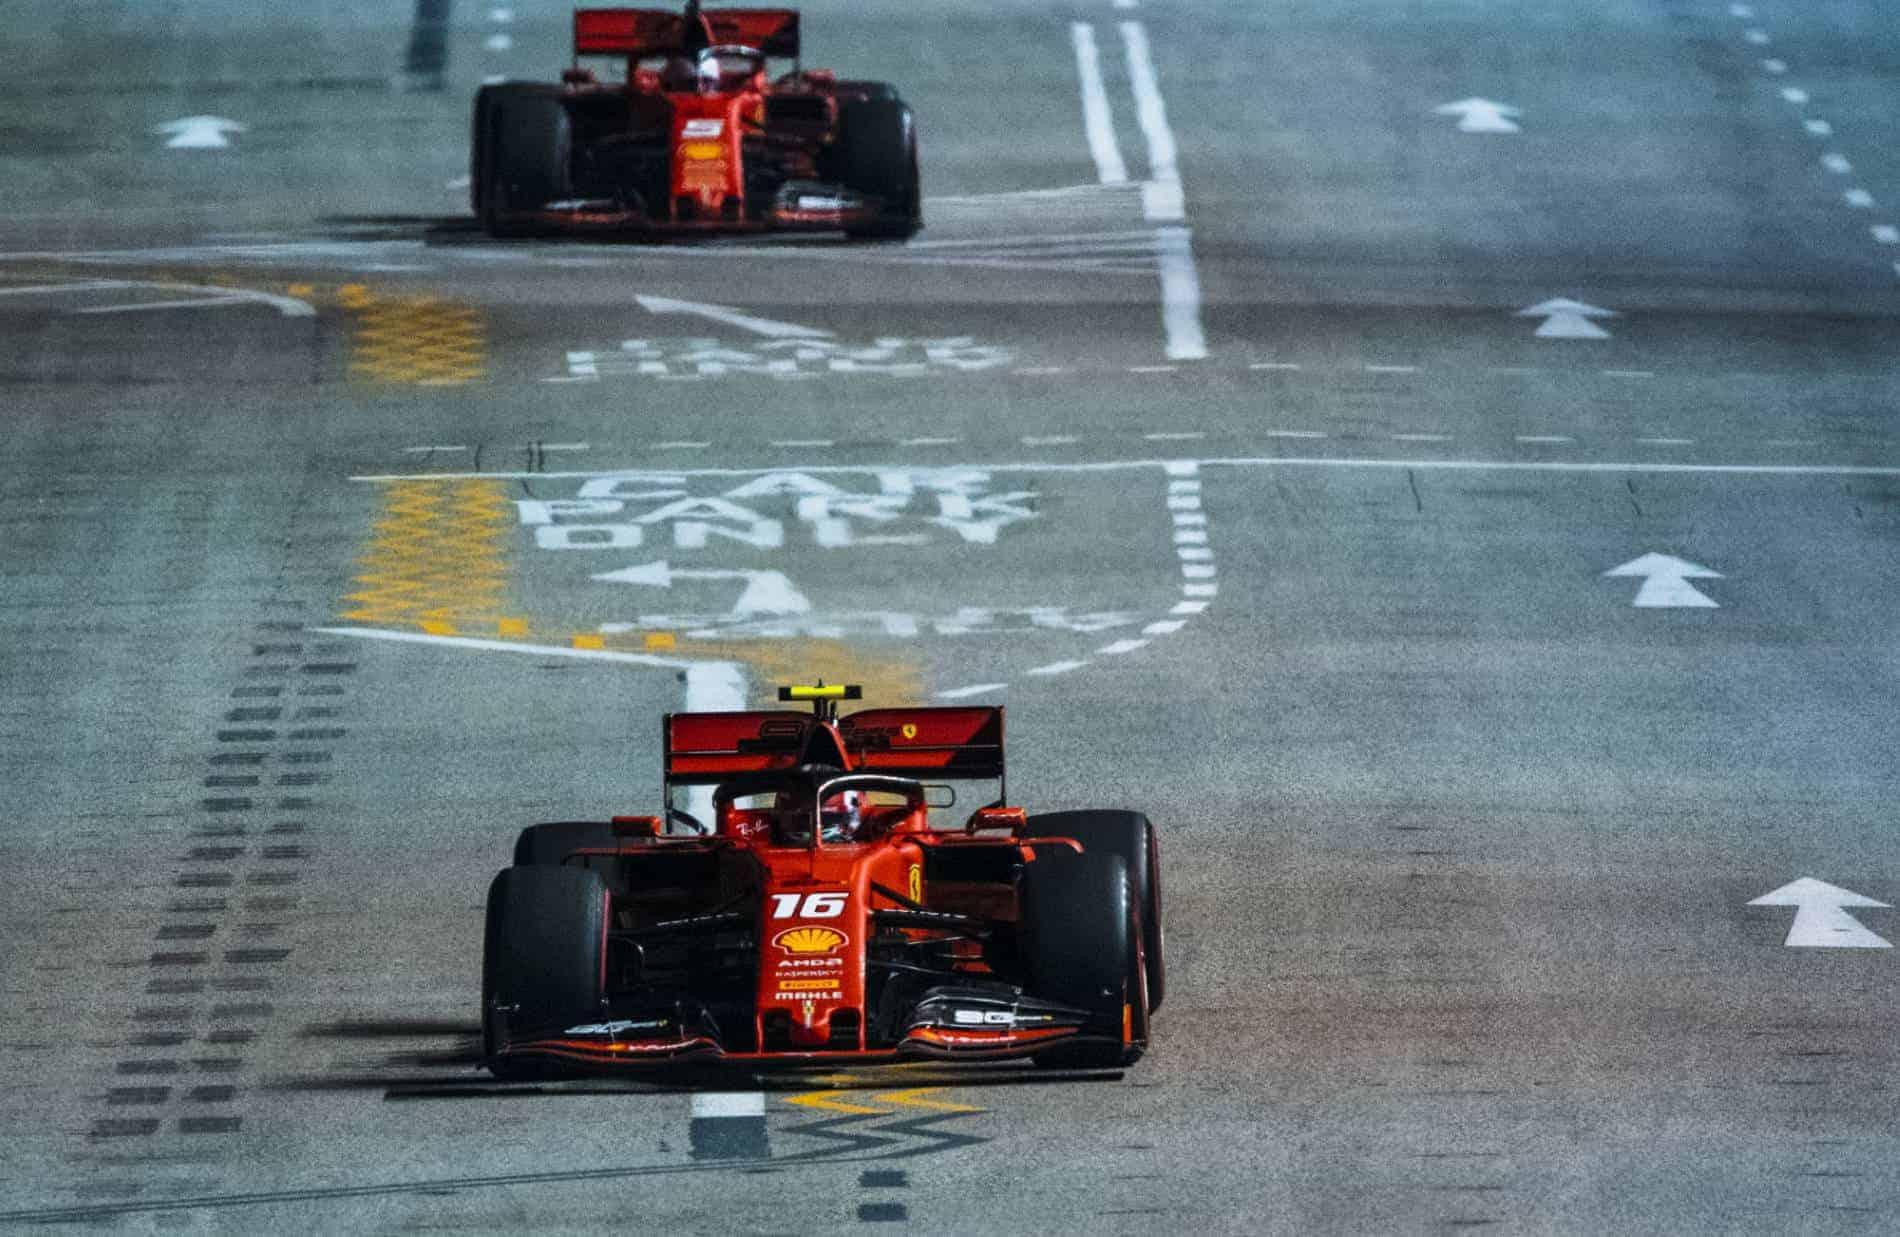 Leclerc and Vettel Singapore GP F1 2019 Photo Ferrari